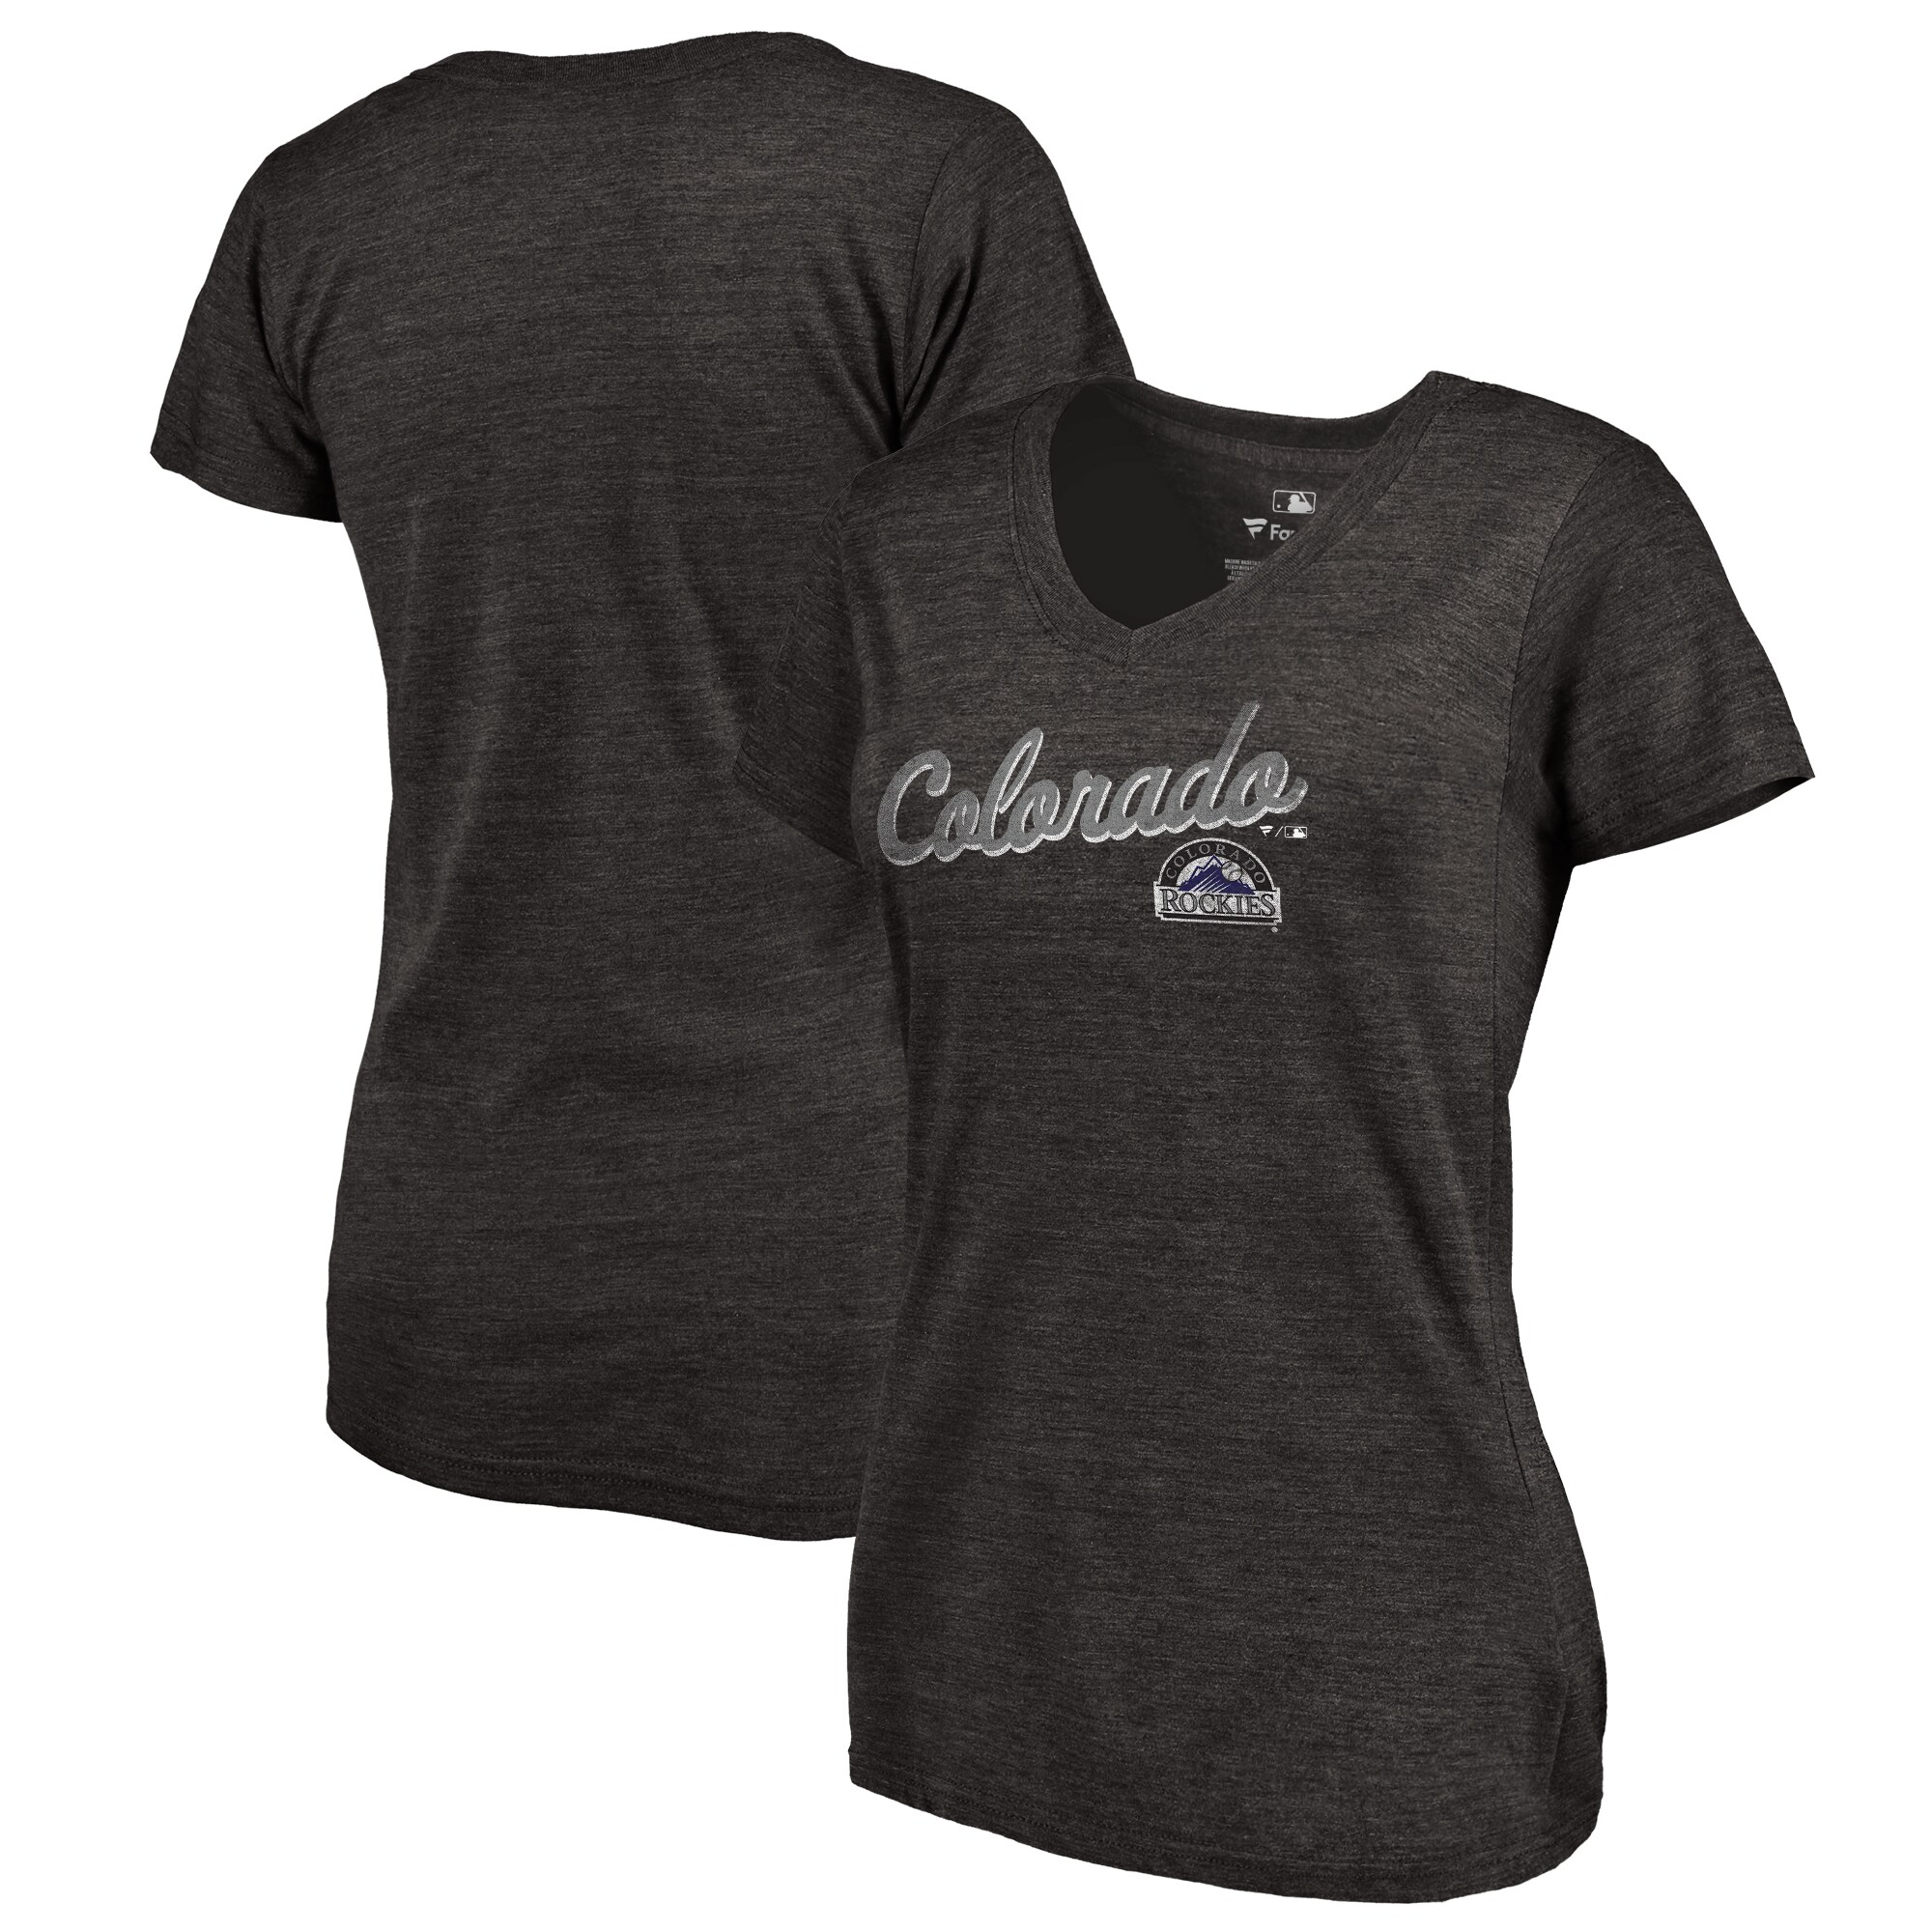 Colorado Rockies Fanatics Branded Women's Rising Script Tri-Blend V-Neck T-Shirt - Black